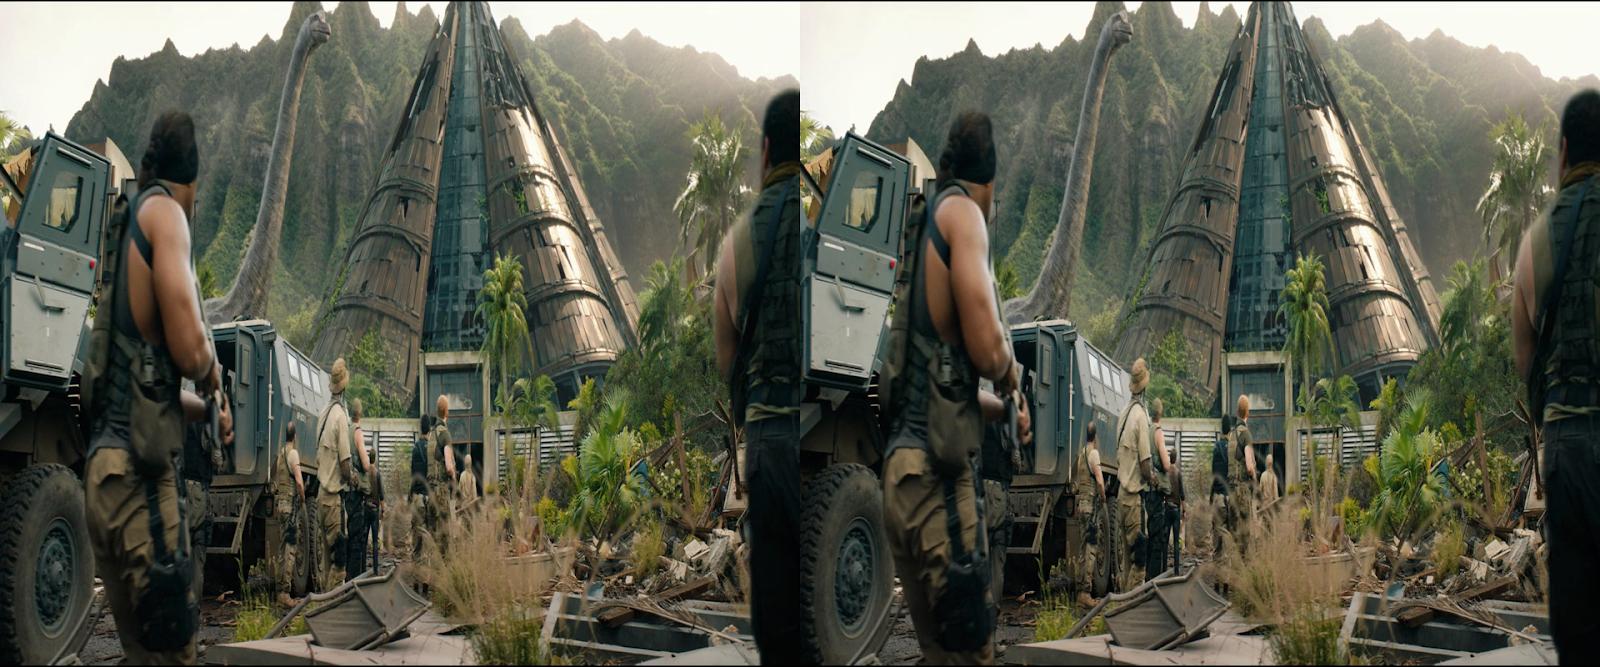 Jurassic World: El Reino Caído (2018) 3D SBS 1080p Latino-Ingles captura 2